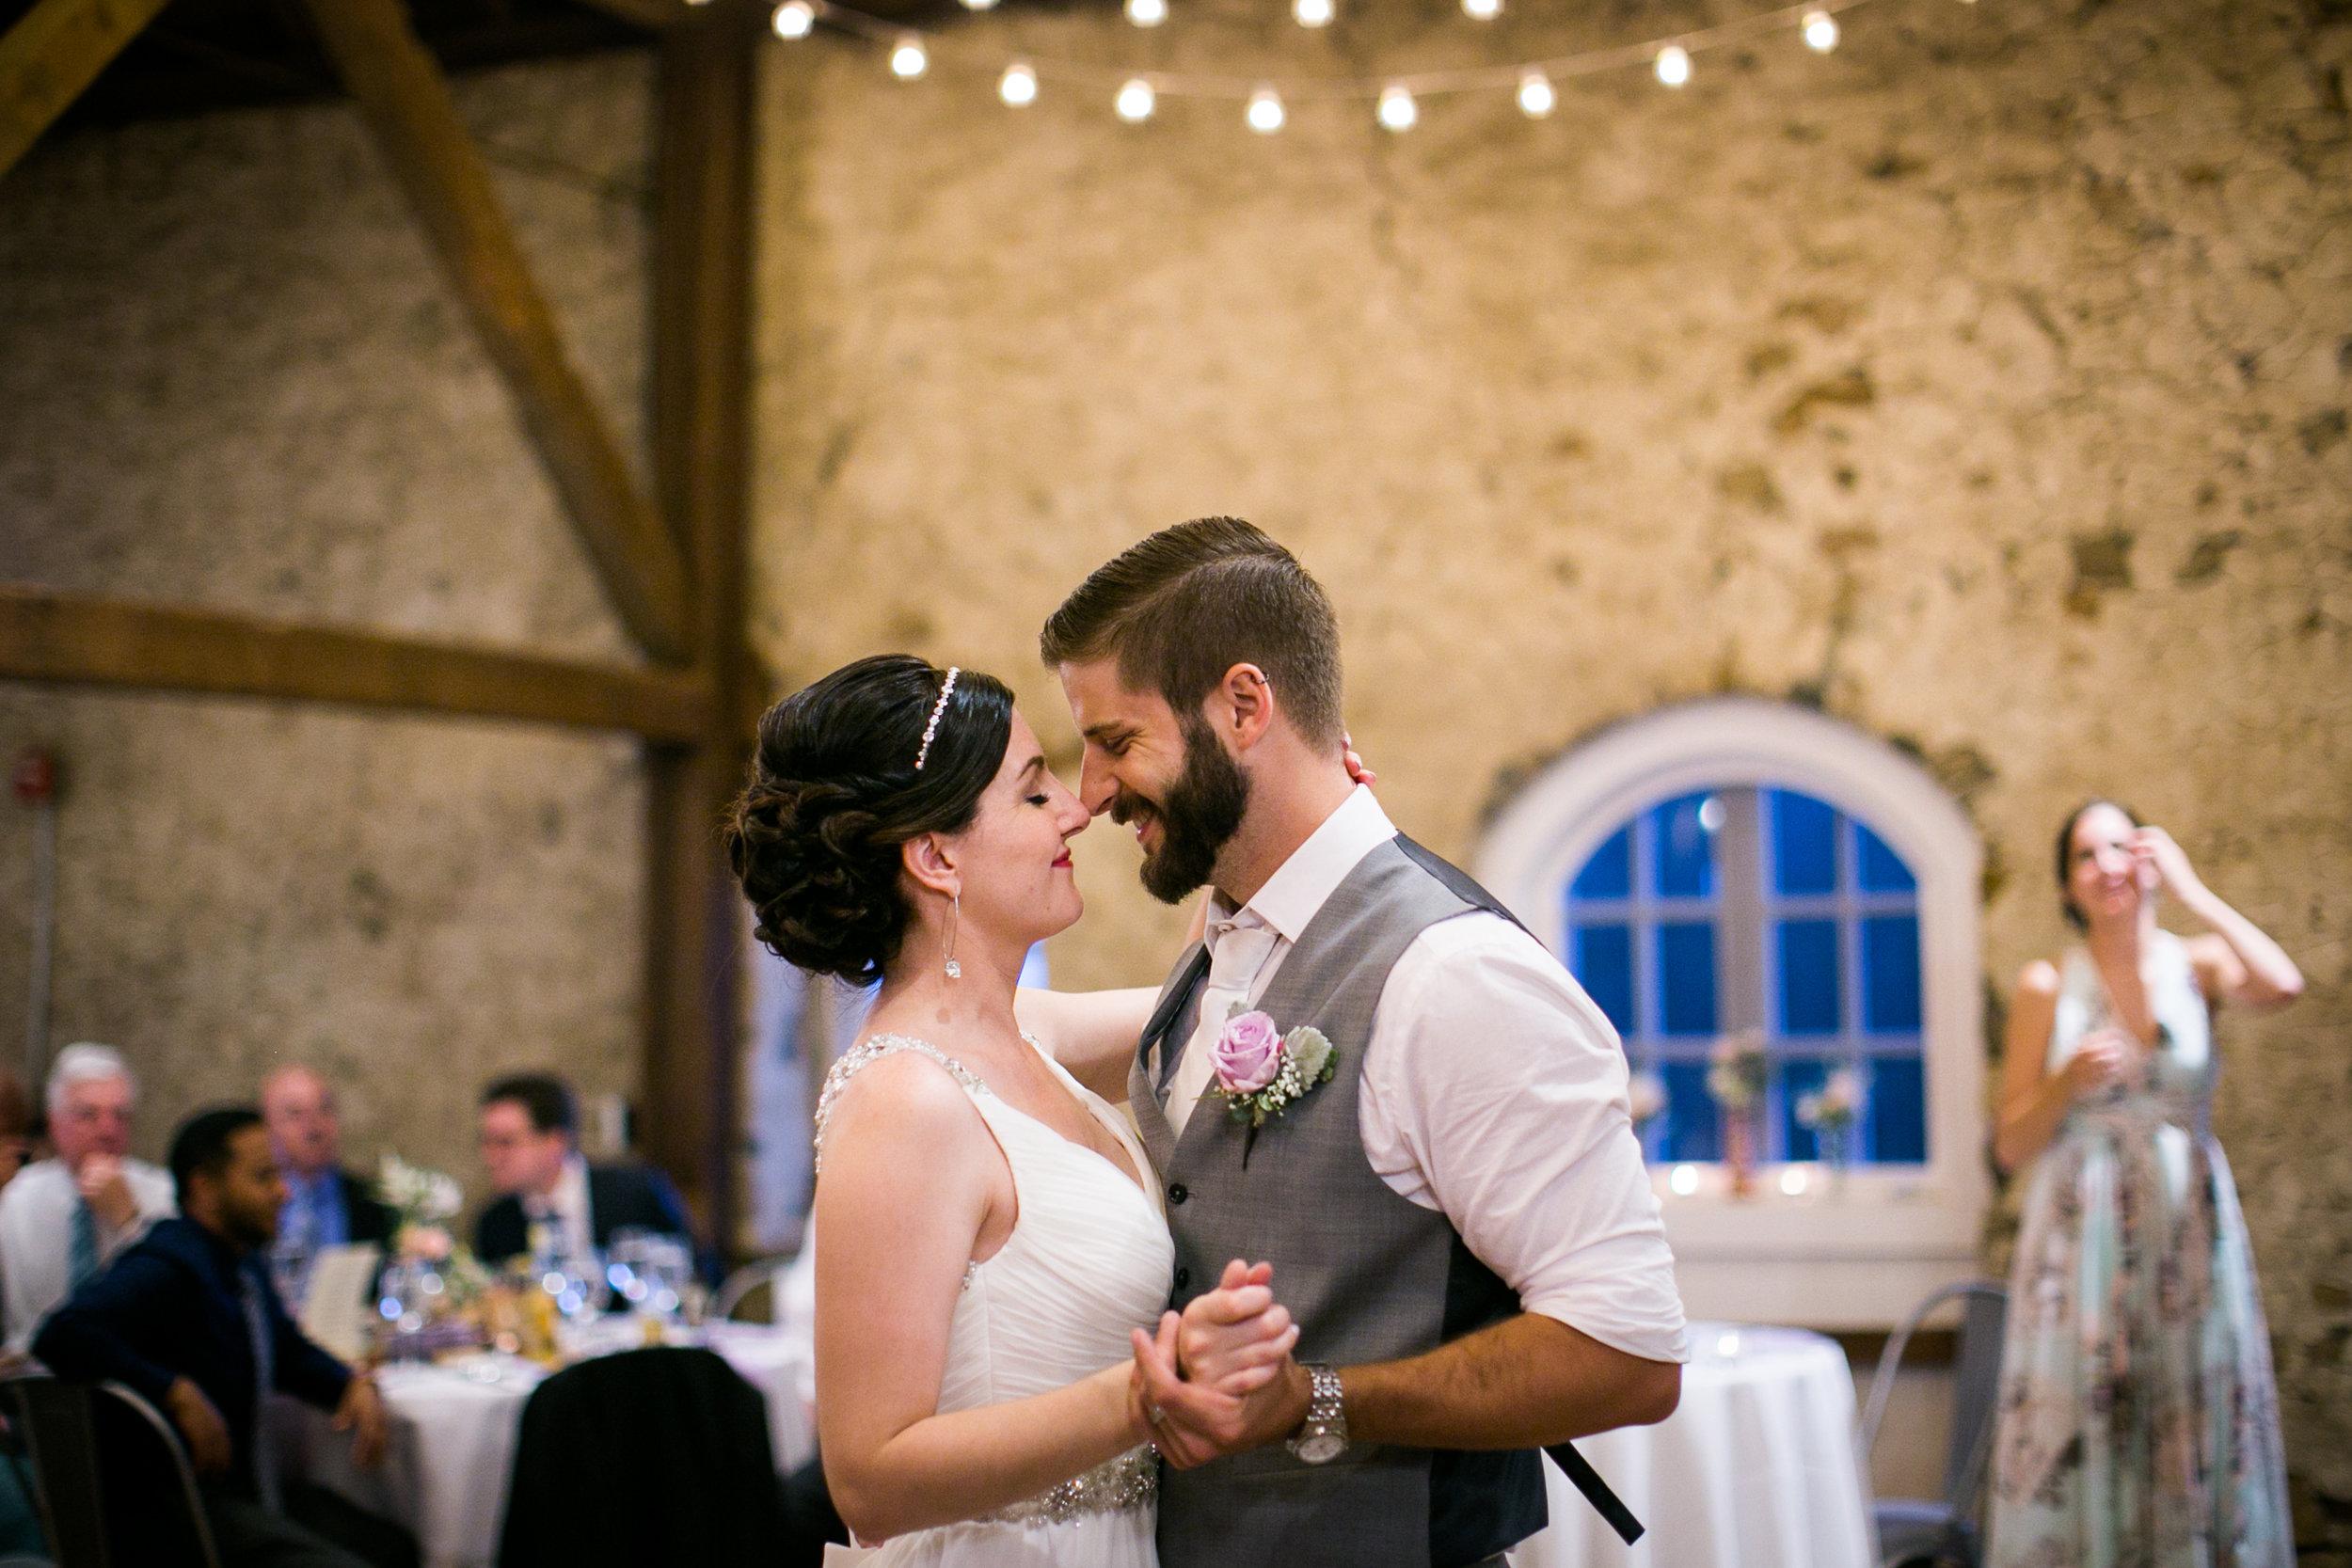 TYLER ARBORETUM WEDDING PHOTOGRAPHY LOVESTRUCK PICTURES-079.jpg